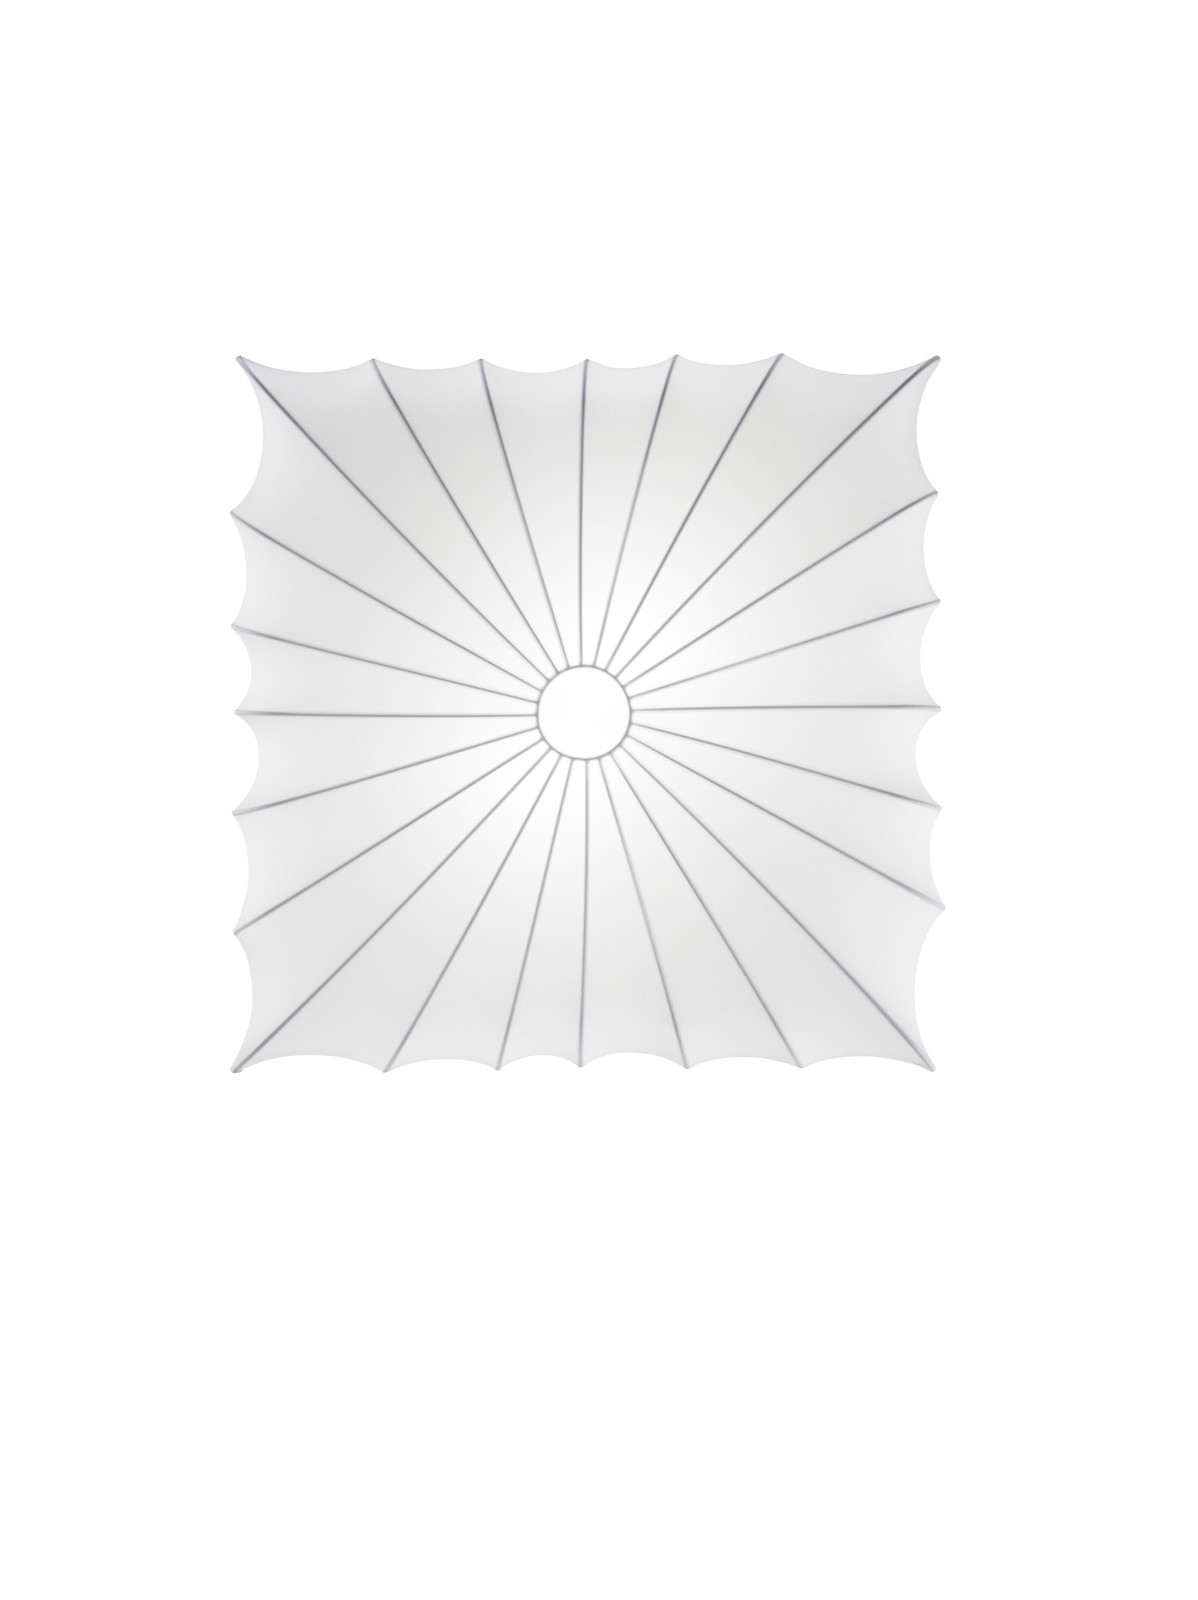 PL Muse Q Wall Light 60 x 60